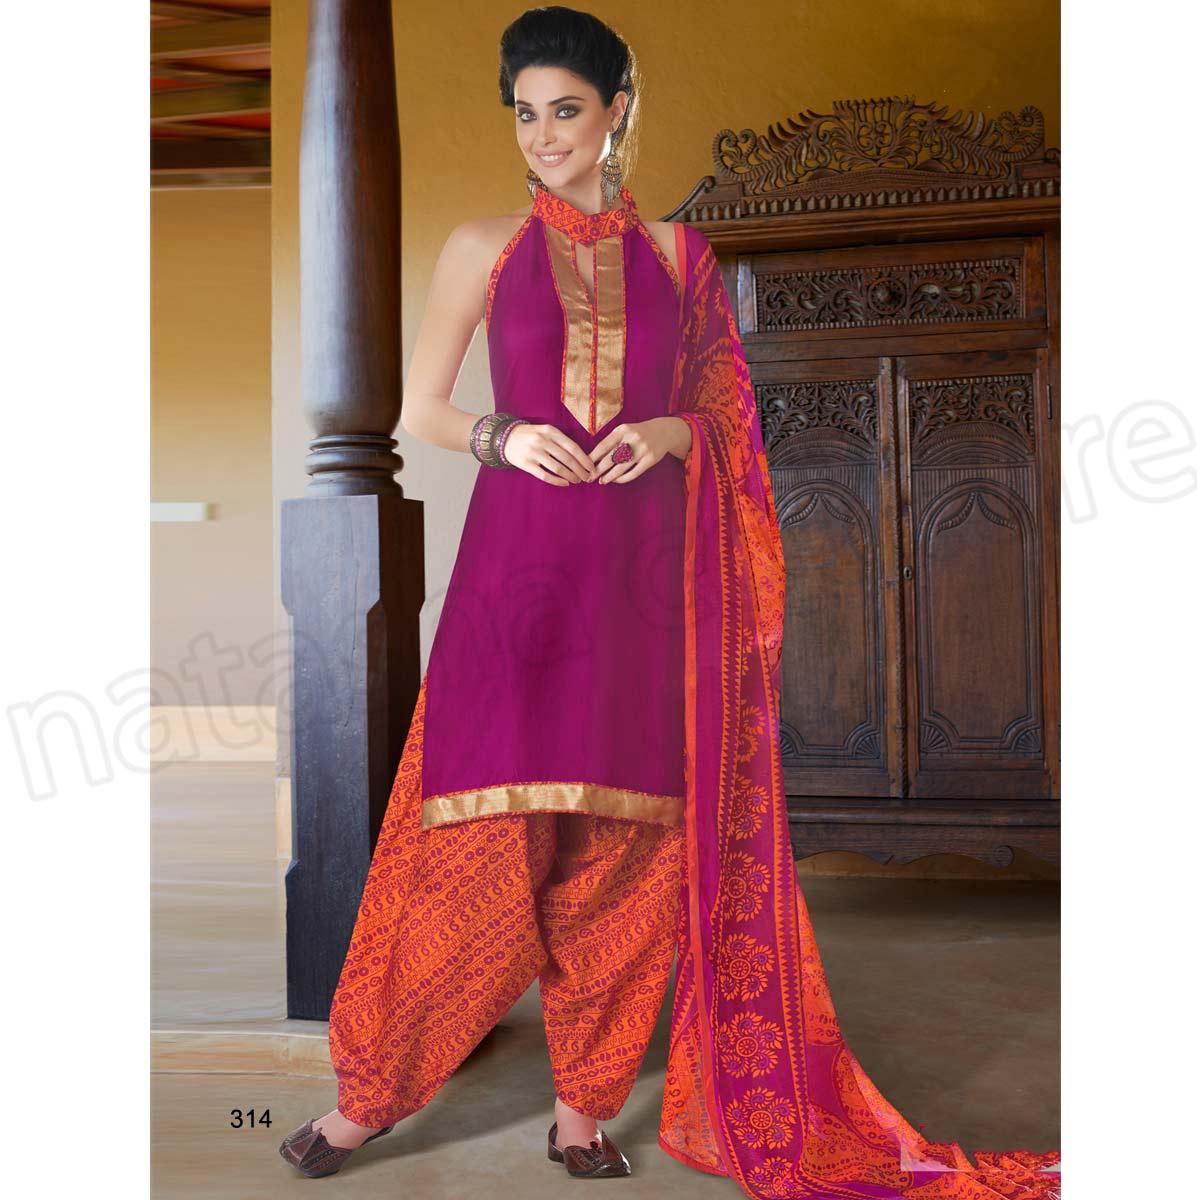 Latest Indian Patiala shalwar kameez fashion 2015-2016 (30)